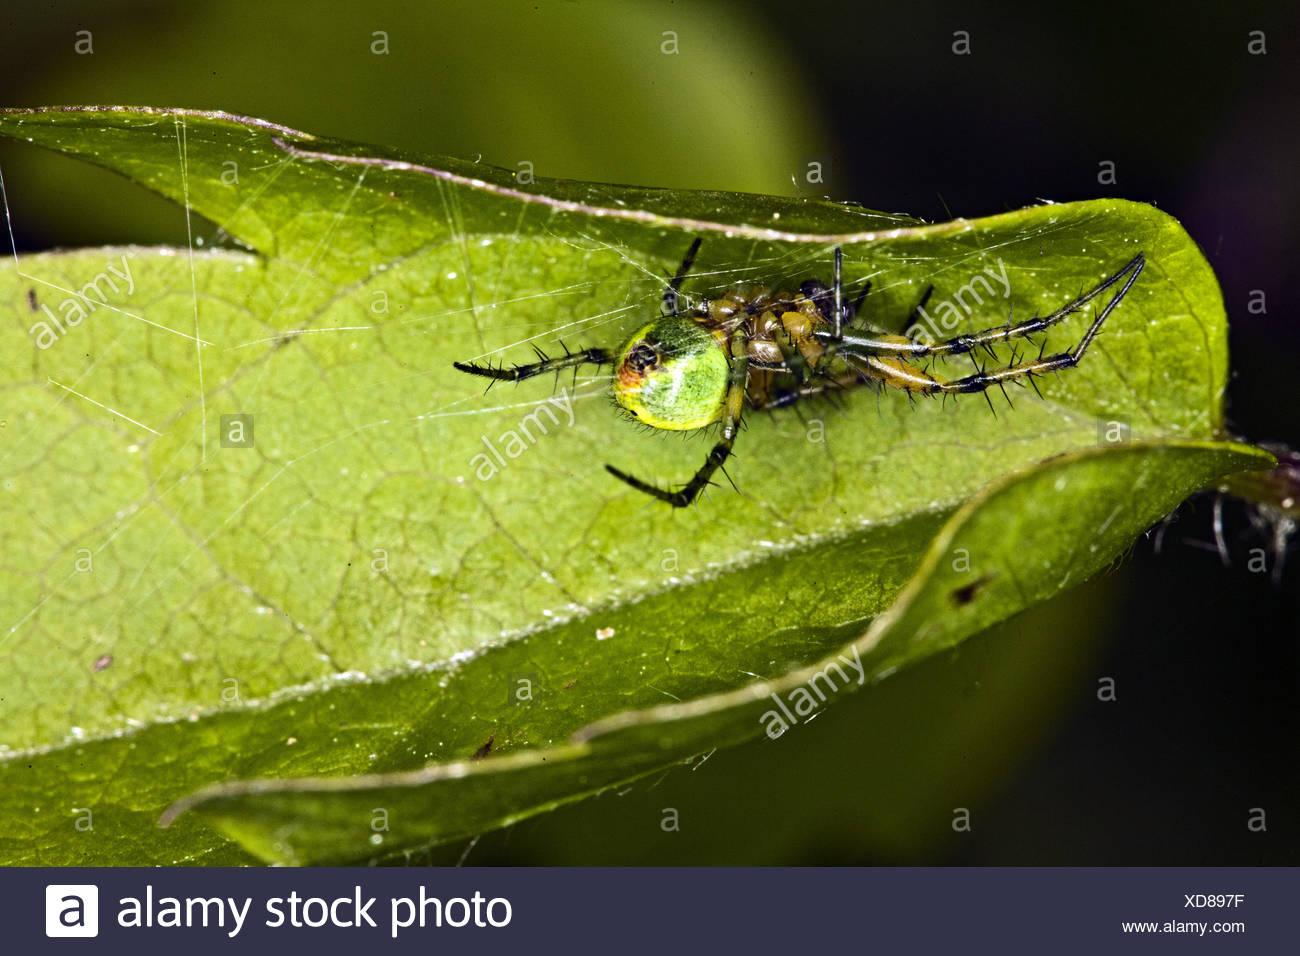 Cucumber Green Spider, Araniella curcubitina - Stock Image